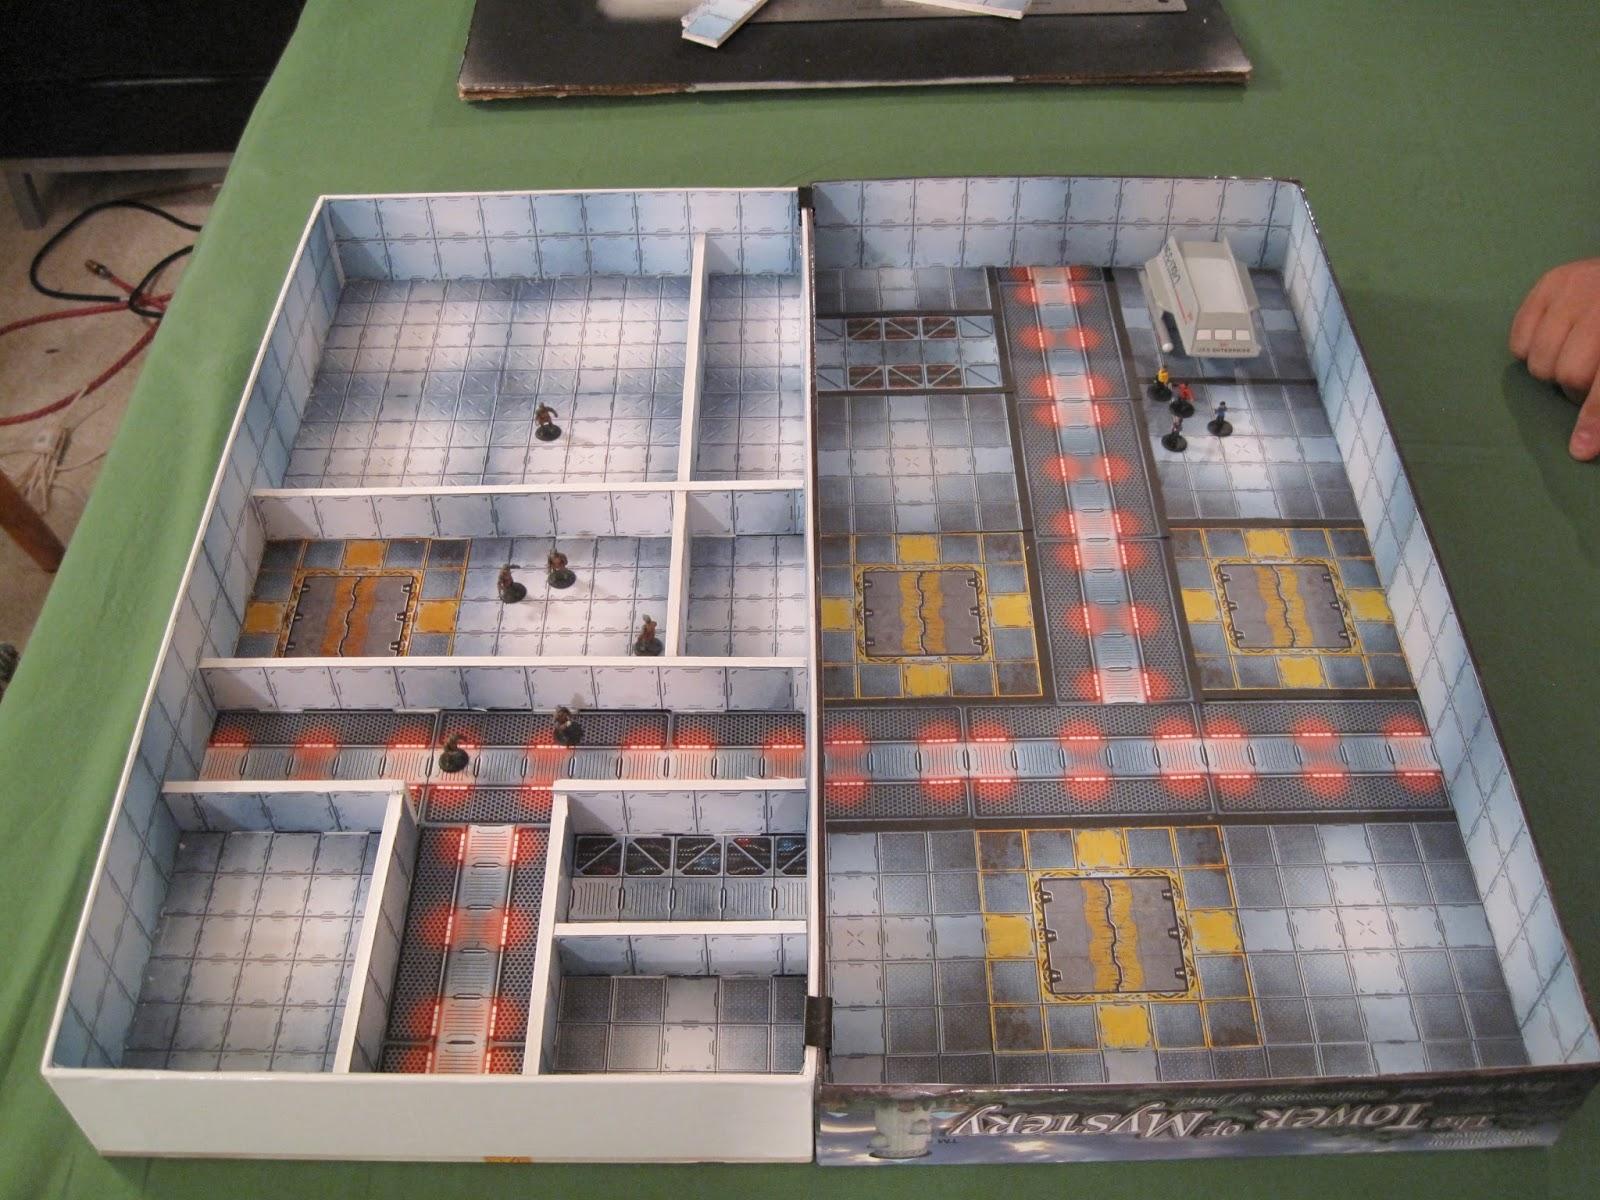 Captain S Blogs Board Game Box Ship Interior